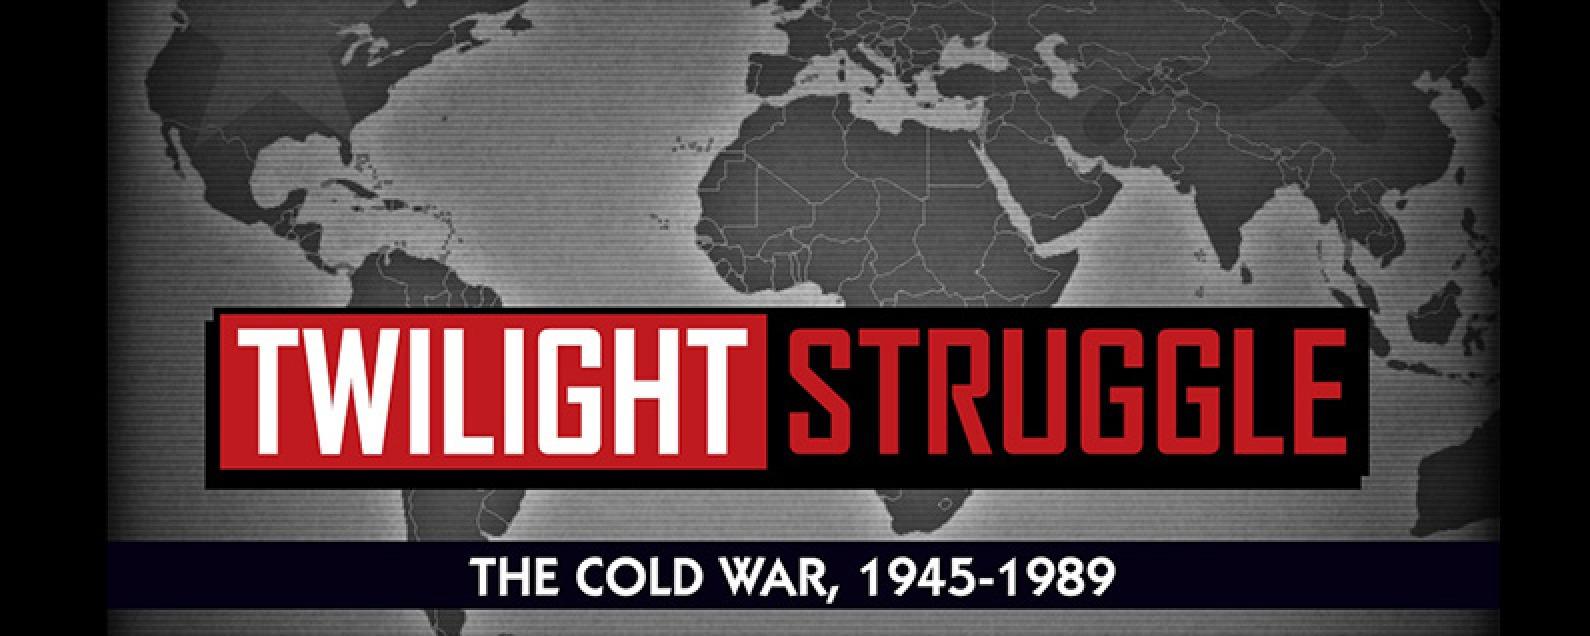 twilight struggle ios